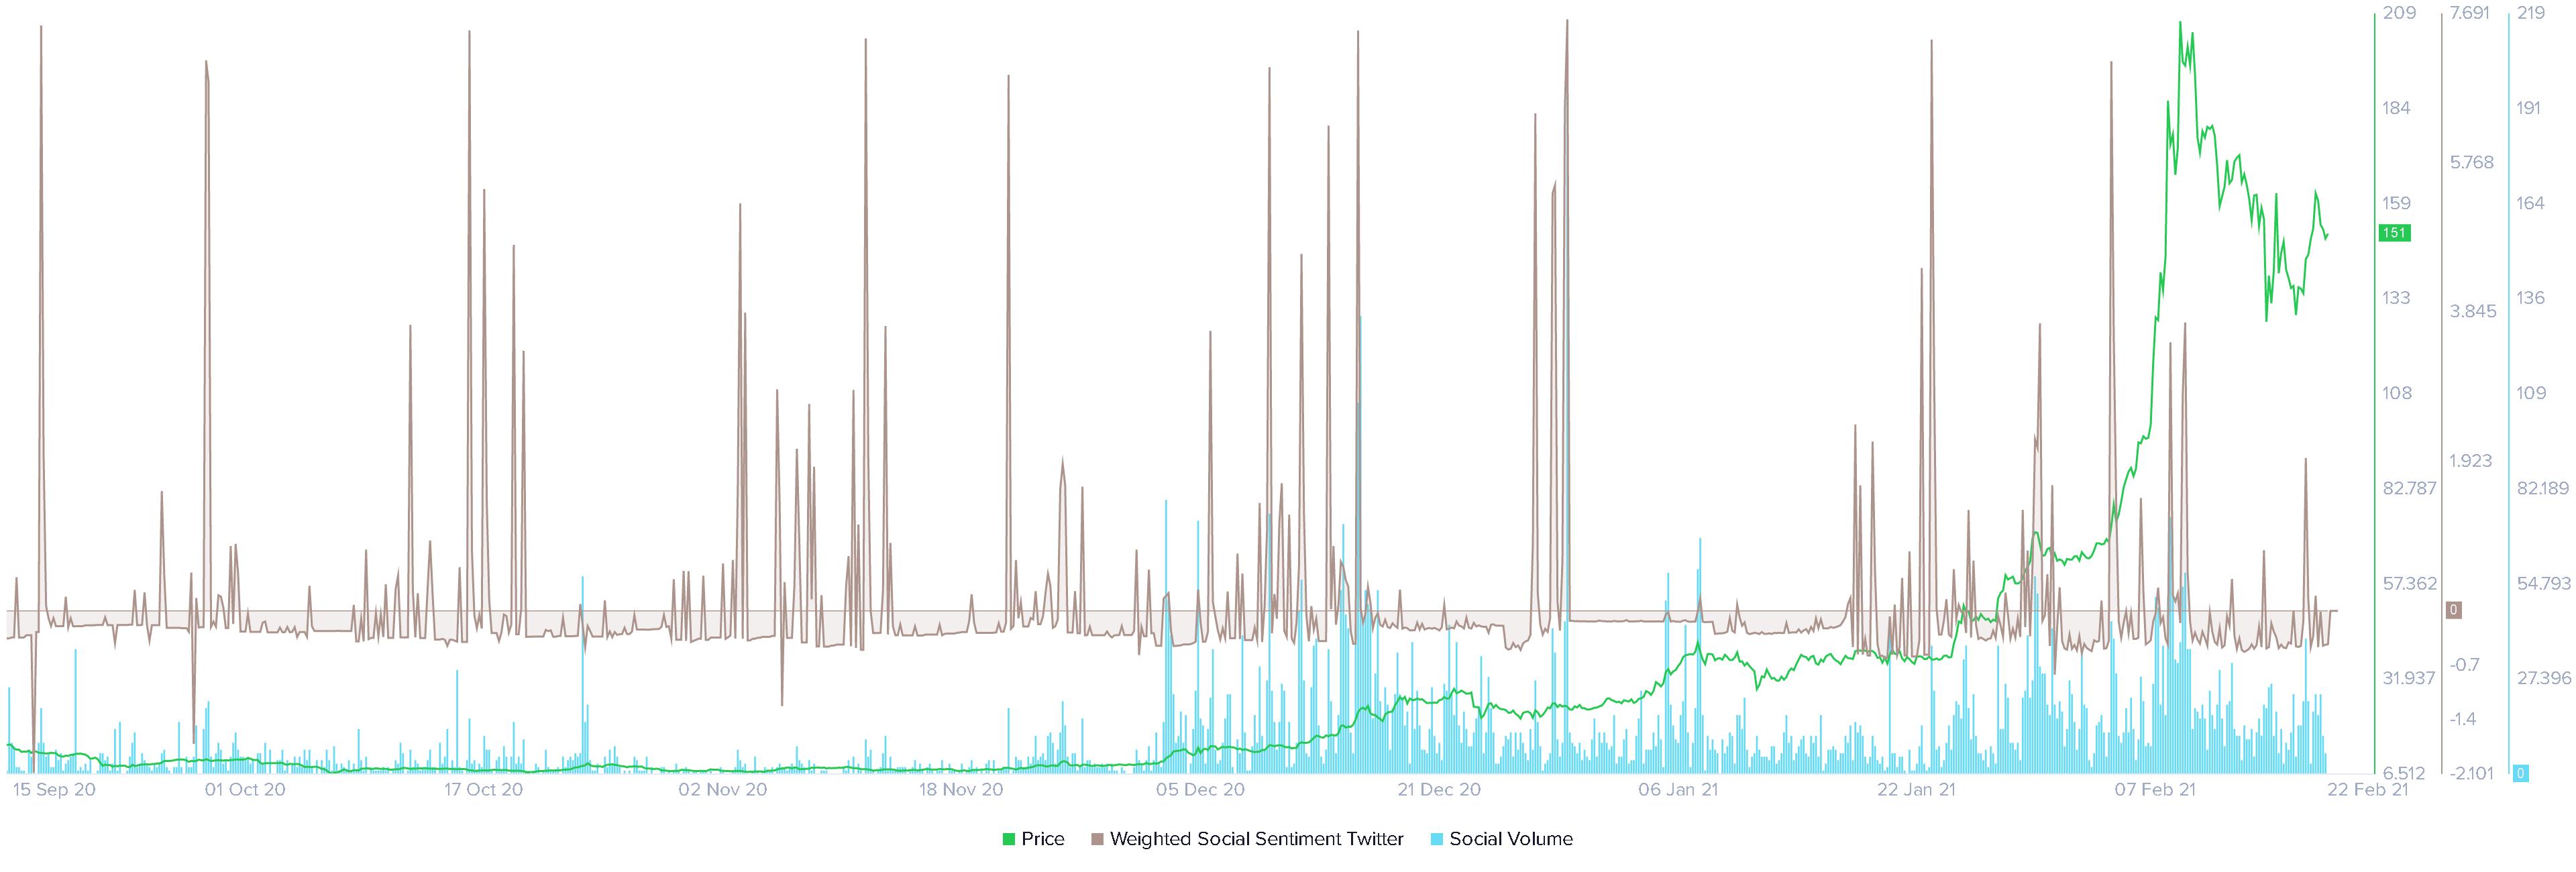 Elrond Social volume Twitter weighted social sentiment chart